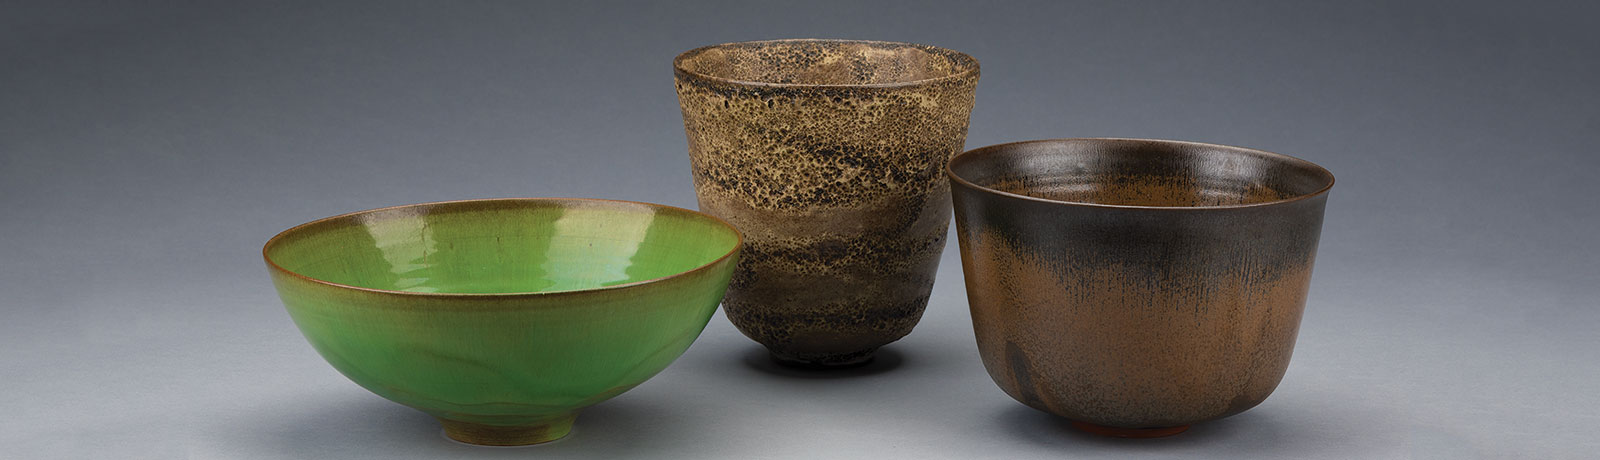 E. John Bullard's collection of American Studio Pottery from the latter half of the twentieth century will be on display beginning November 4th.